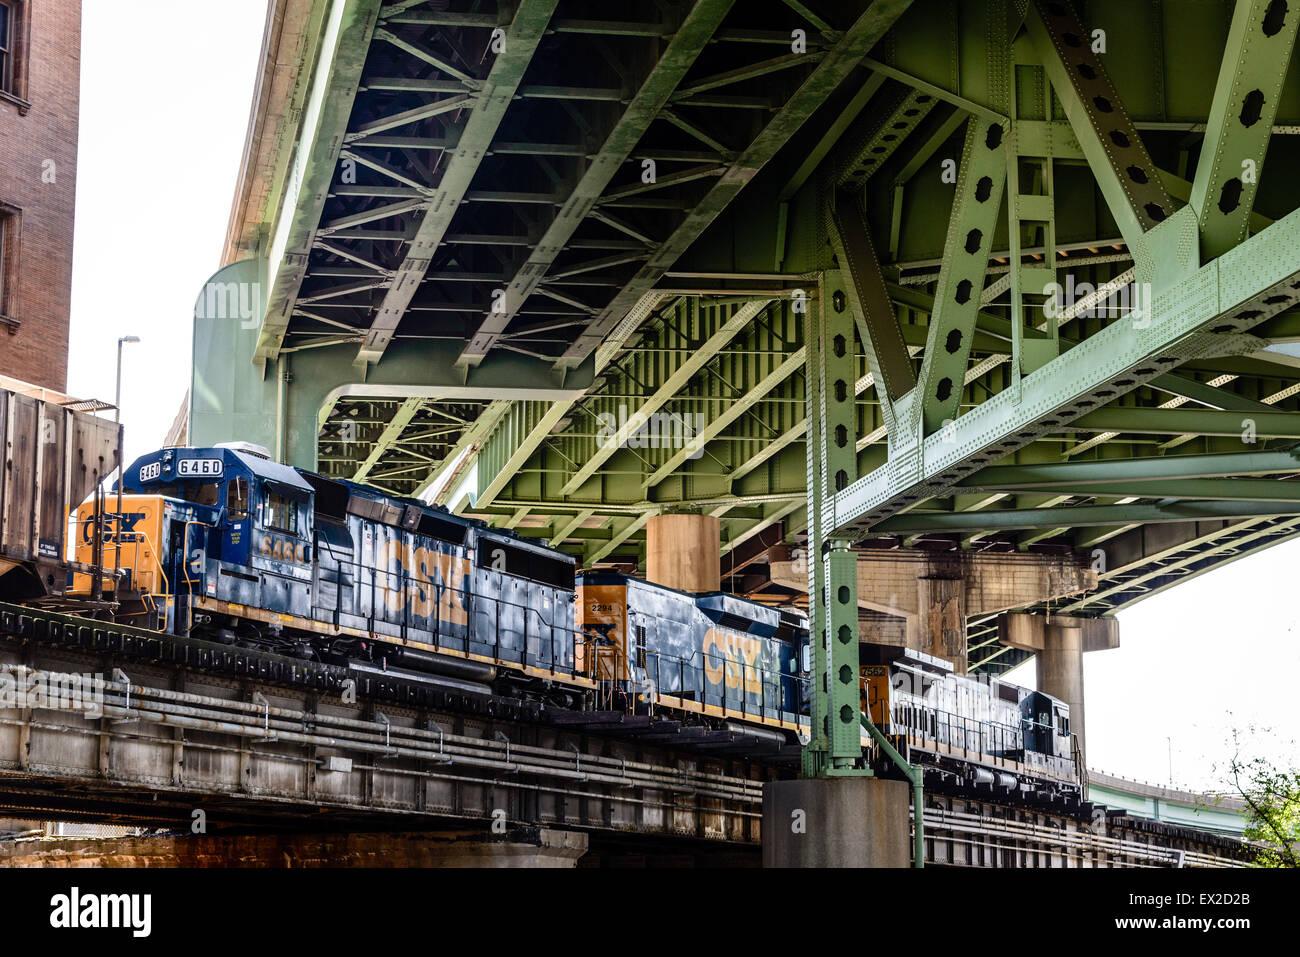 CSX Freight Train passing Main Street Station, Richmond, Virginia - Stock Image